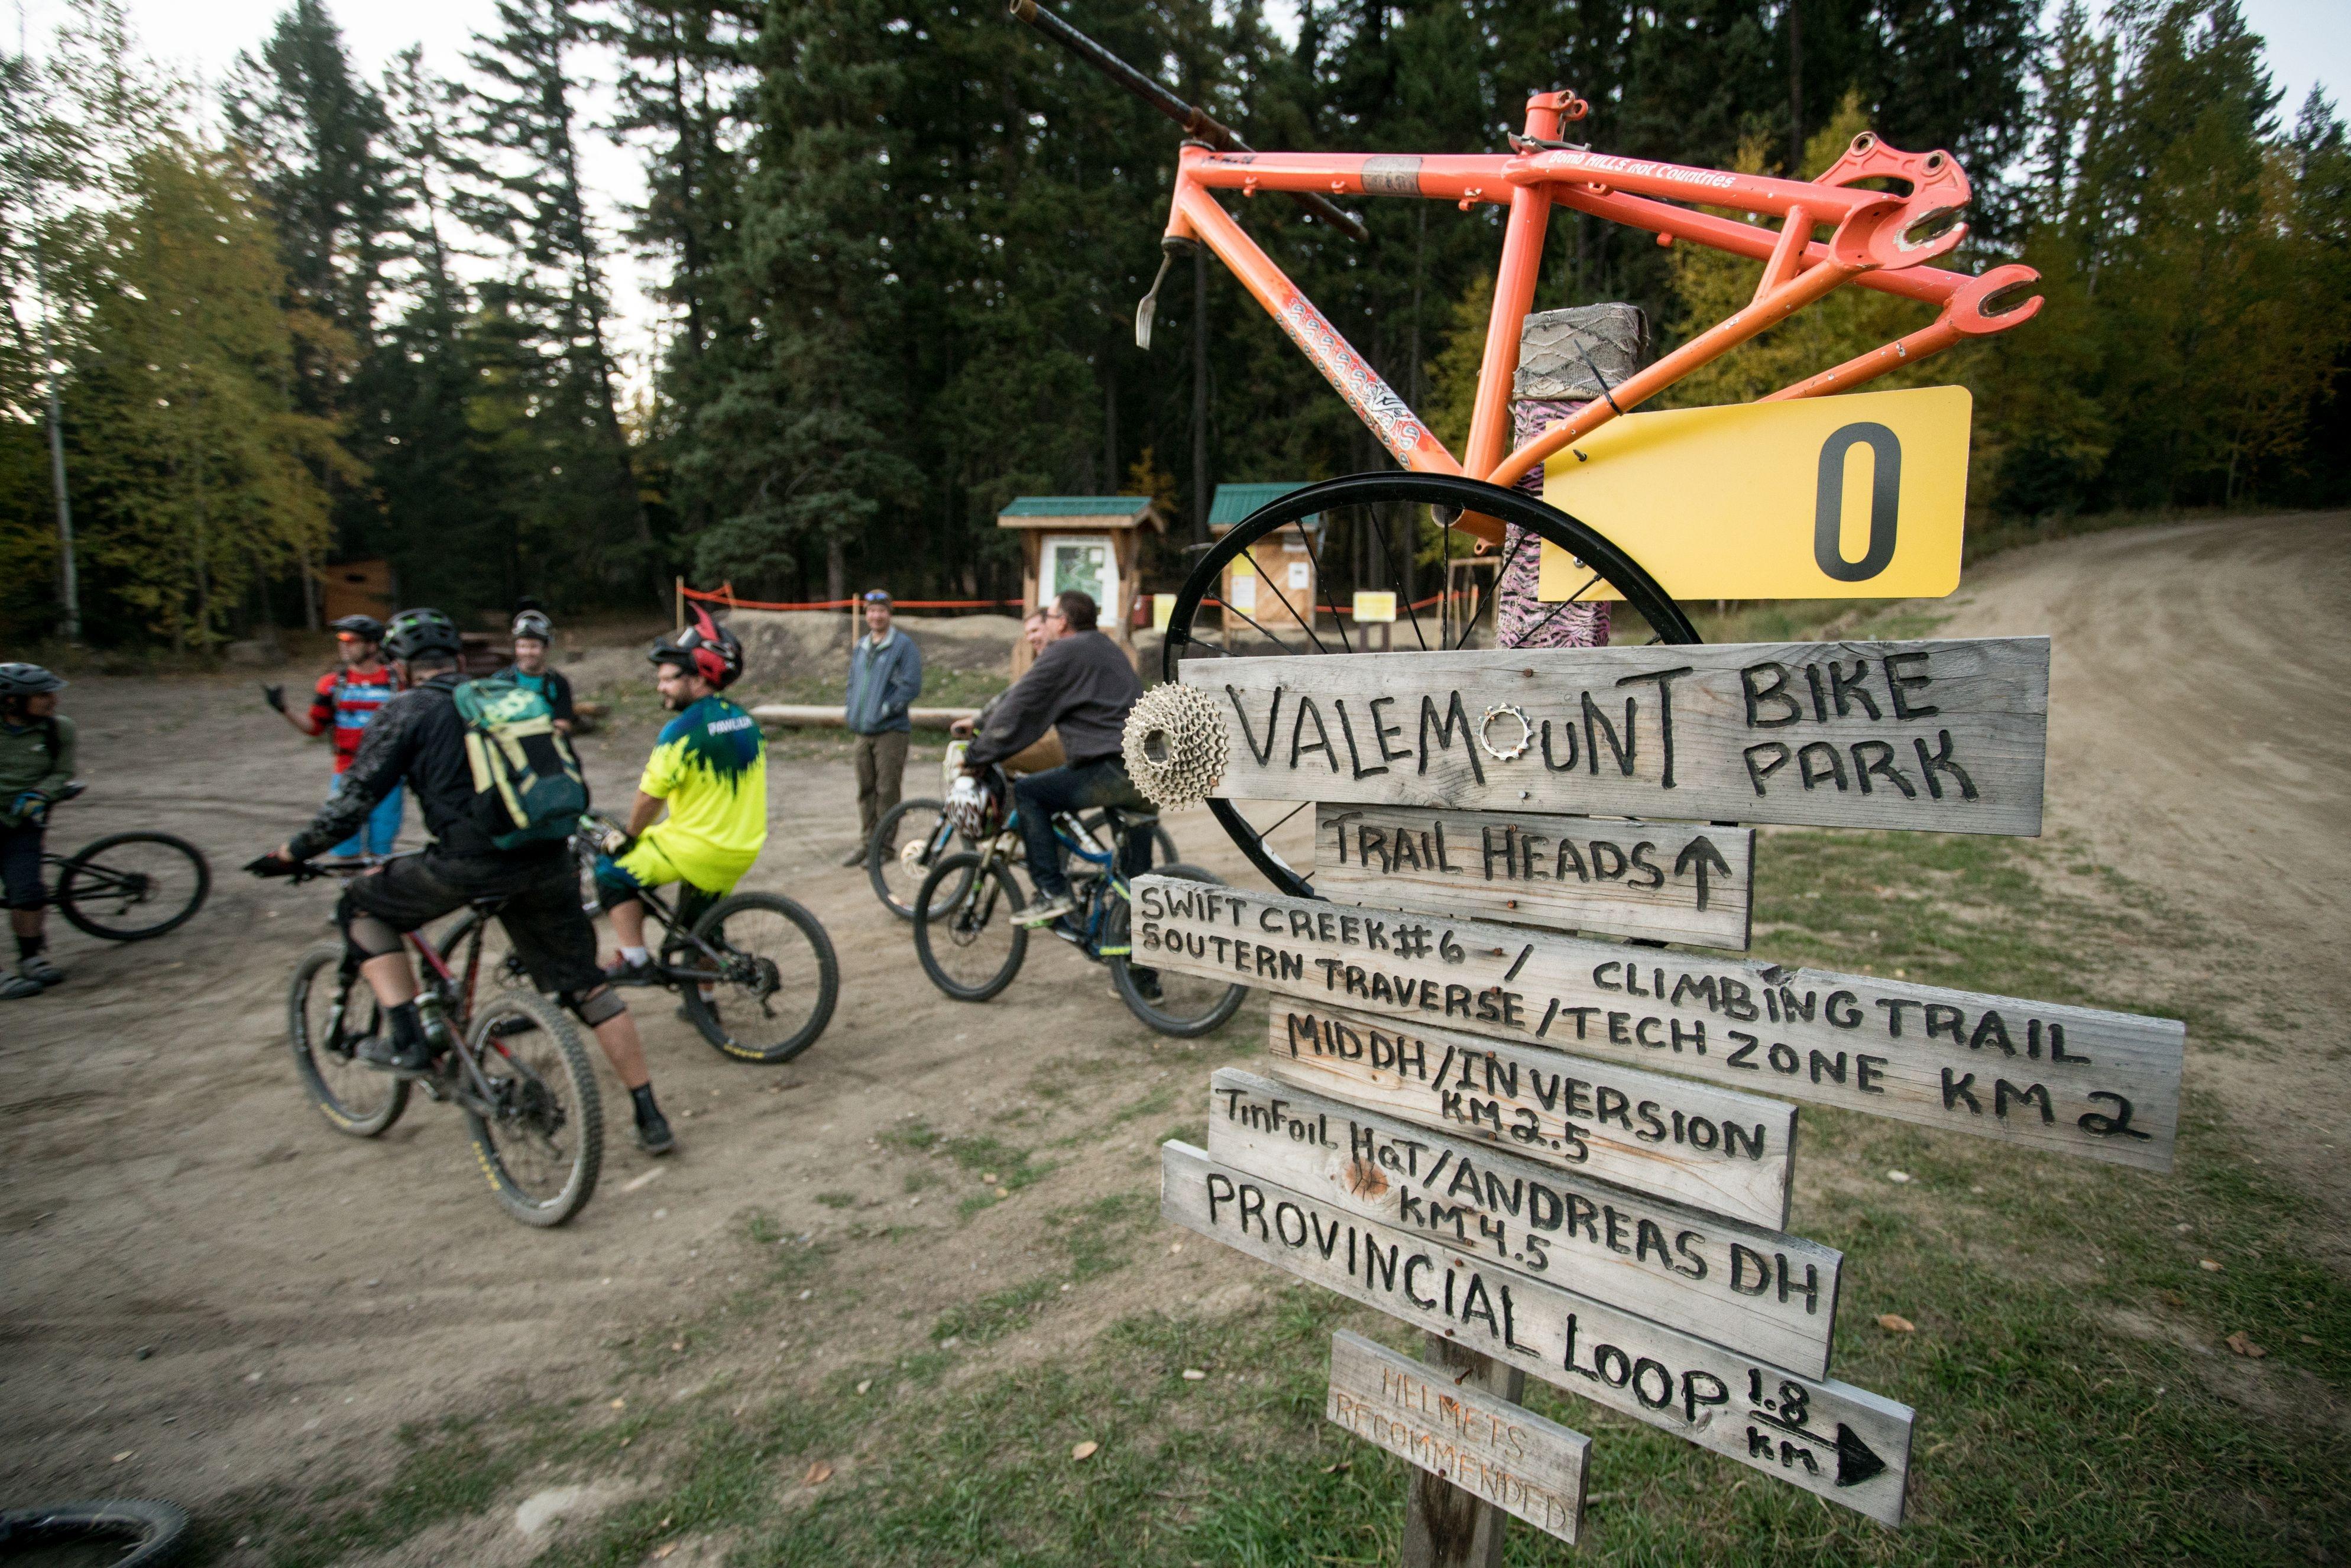 Valemount Bike Park directory